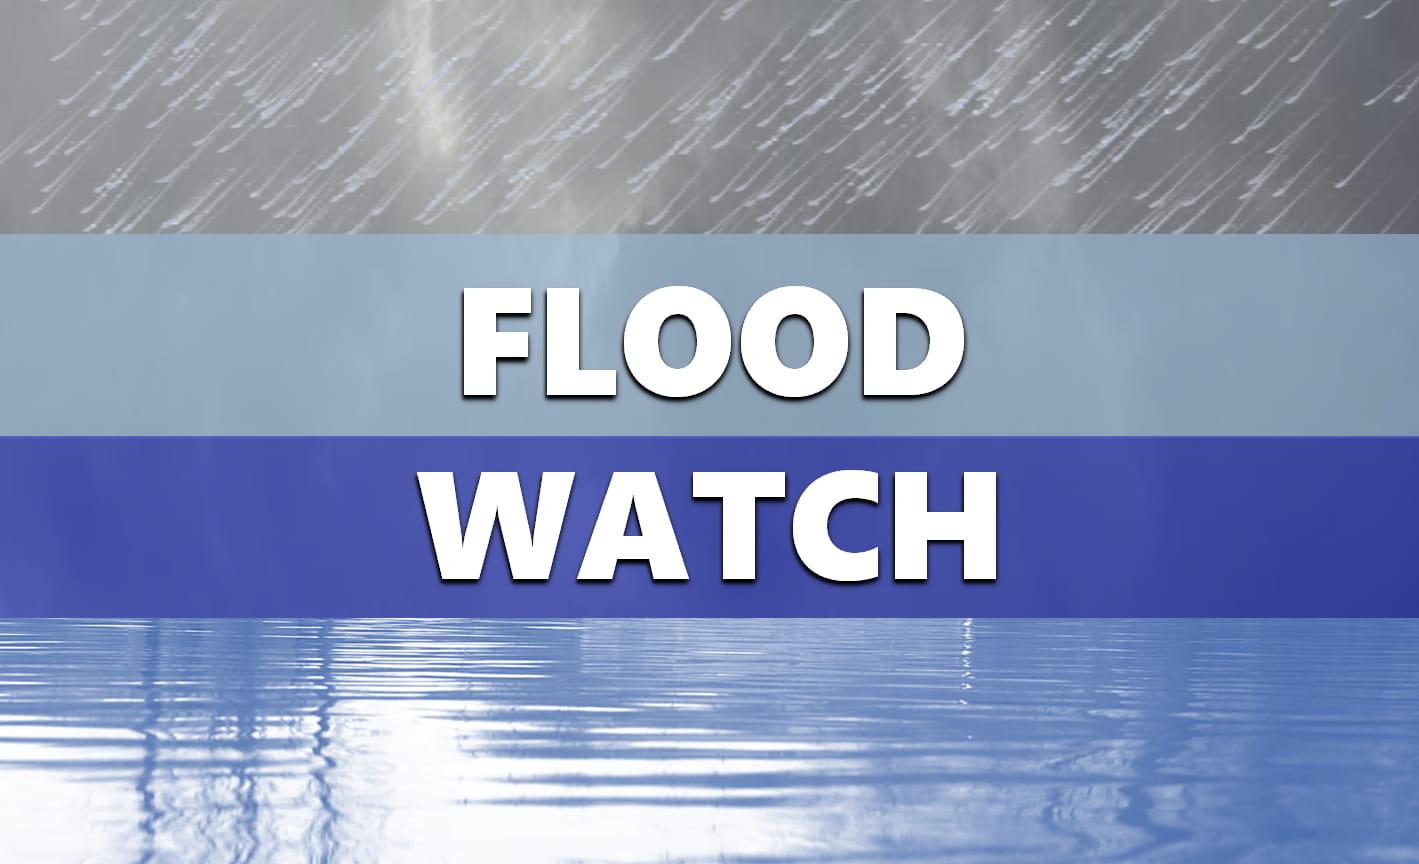 Three Inches of Rain Possible Starting Tonight, Dubois County Region Under Flood Watch